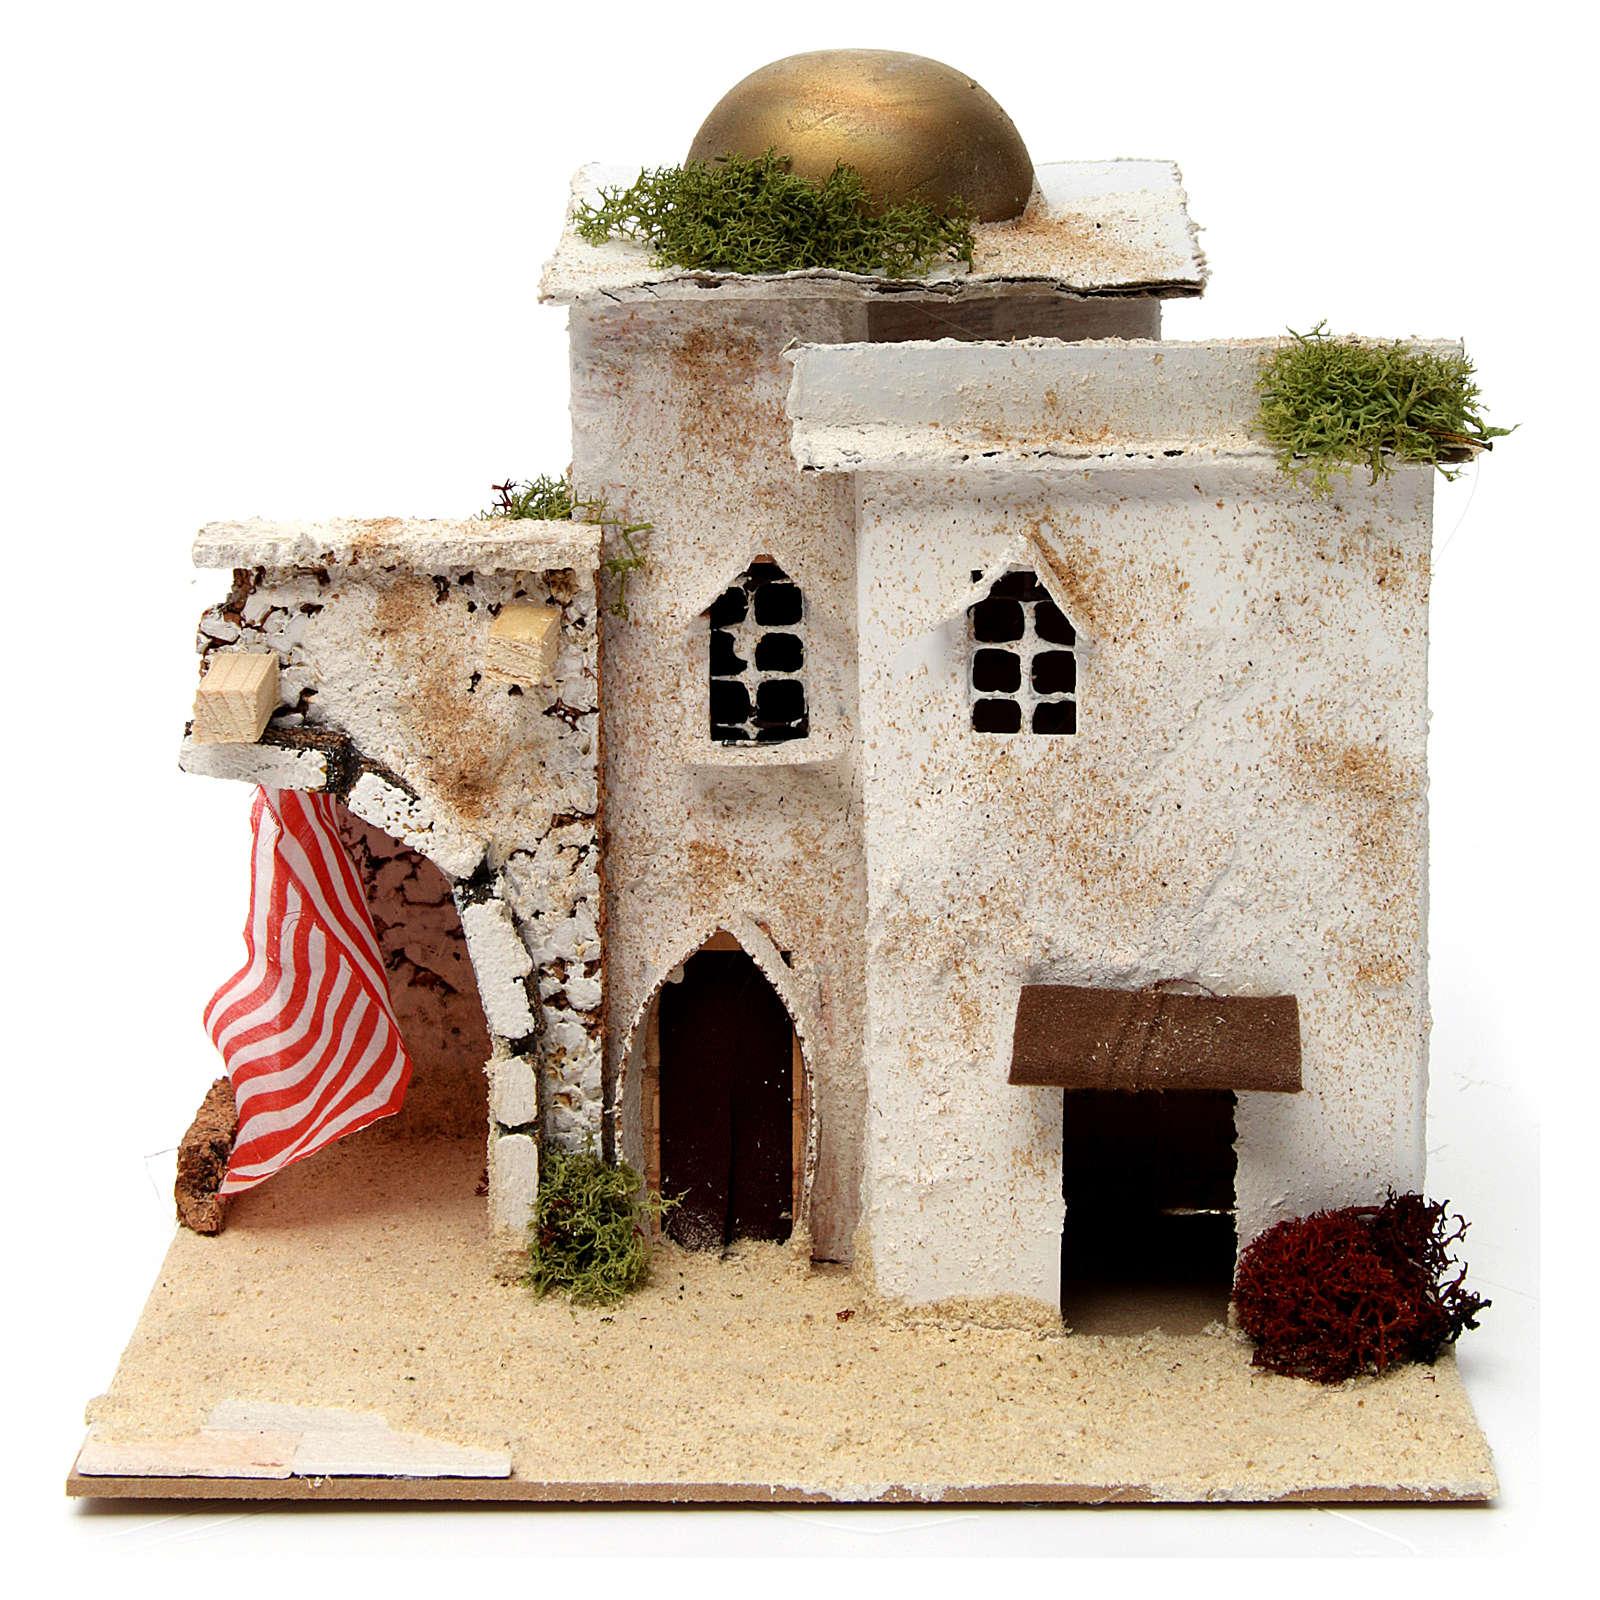 Casa stile arabo cupola e abitazioni aperte 20x25x20 cm 4